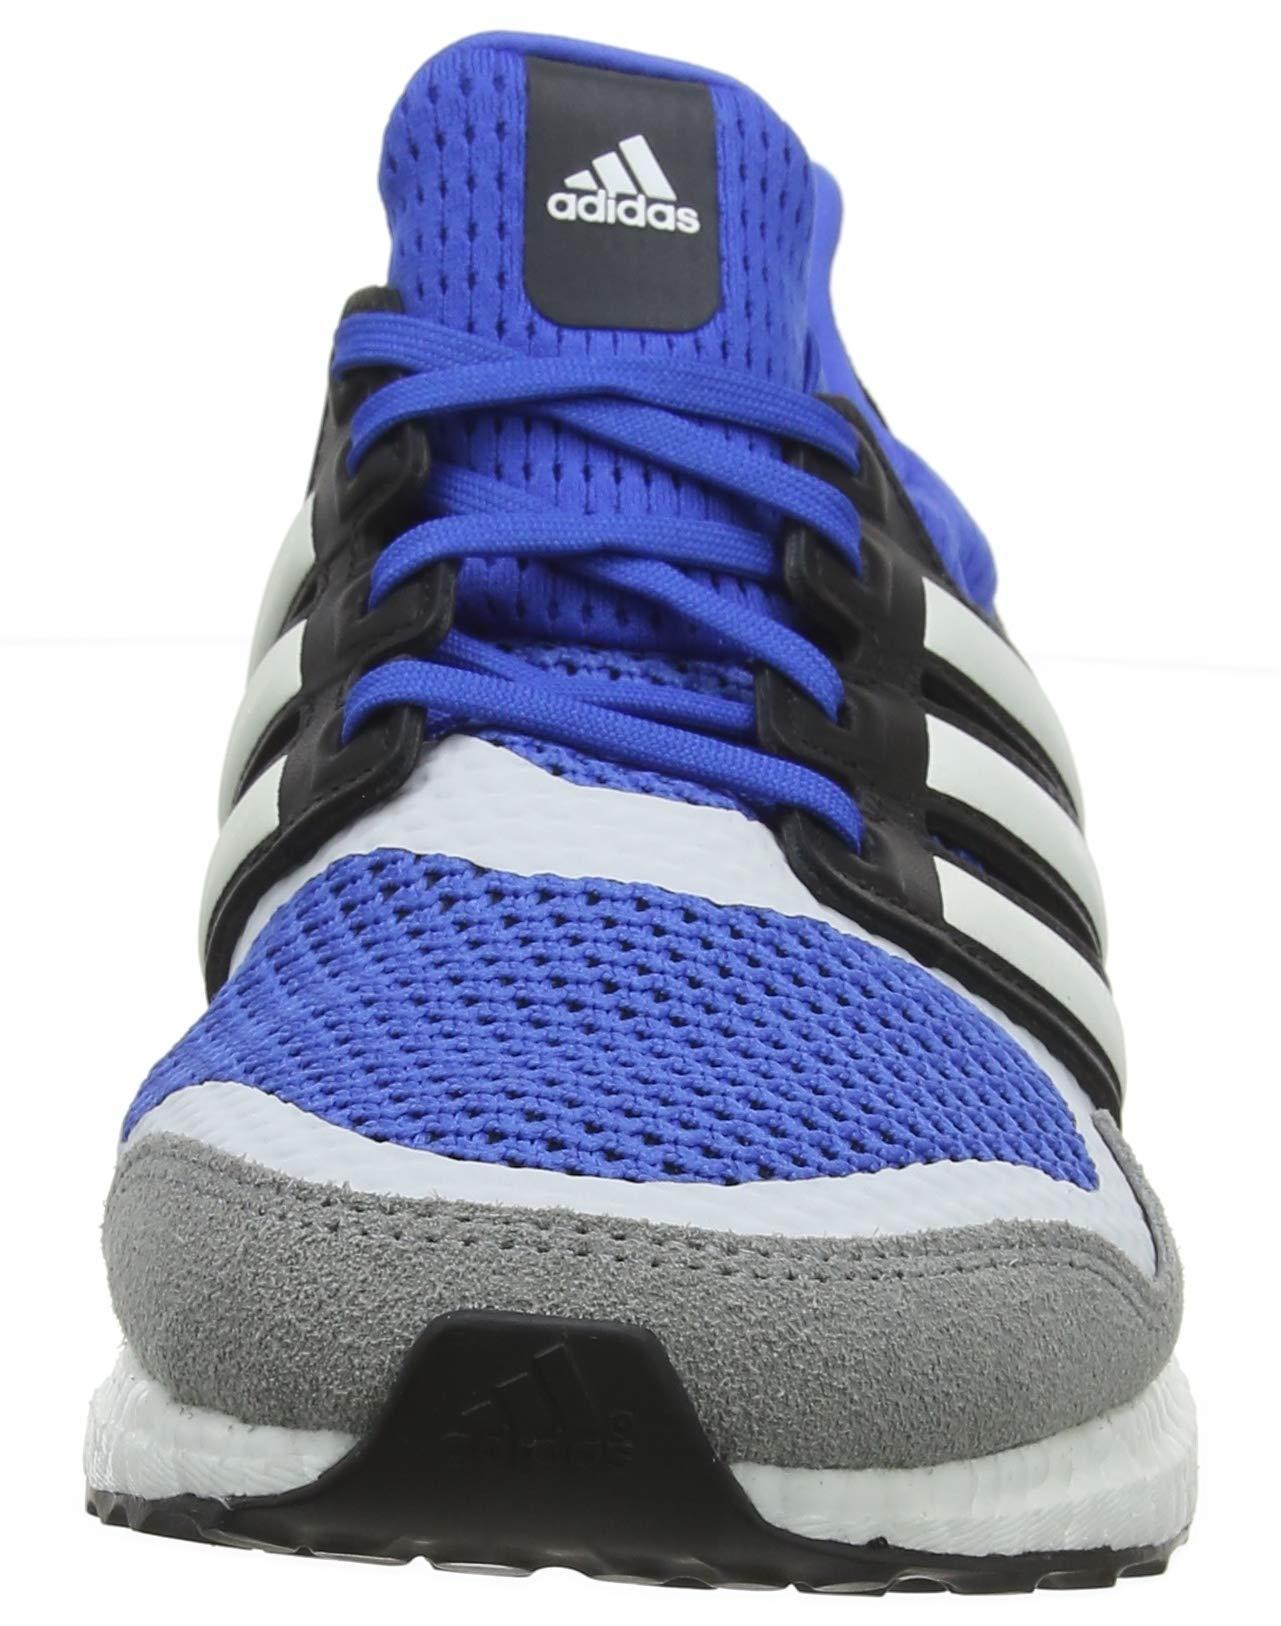 adidas Ultraboost S&l, Scarpe da Running Uomo 4 spesavip